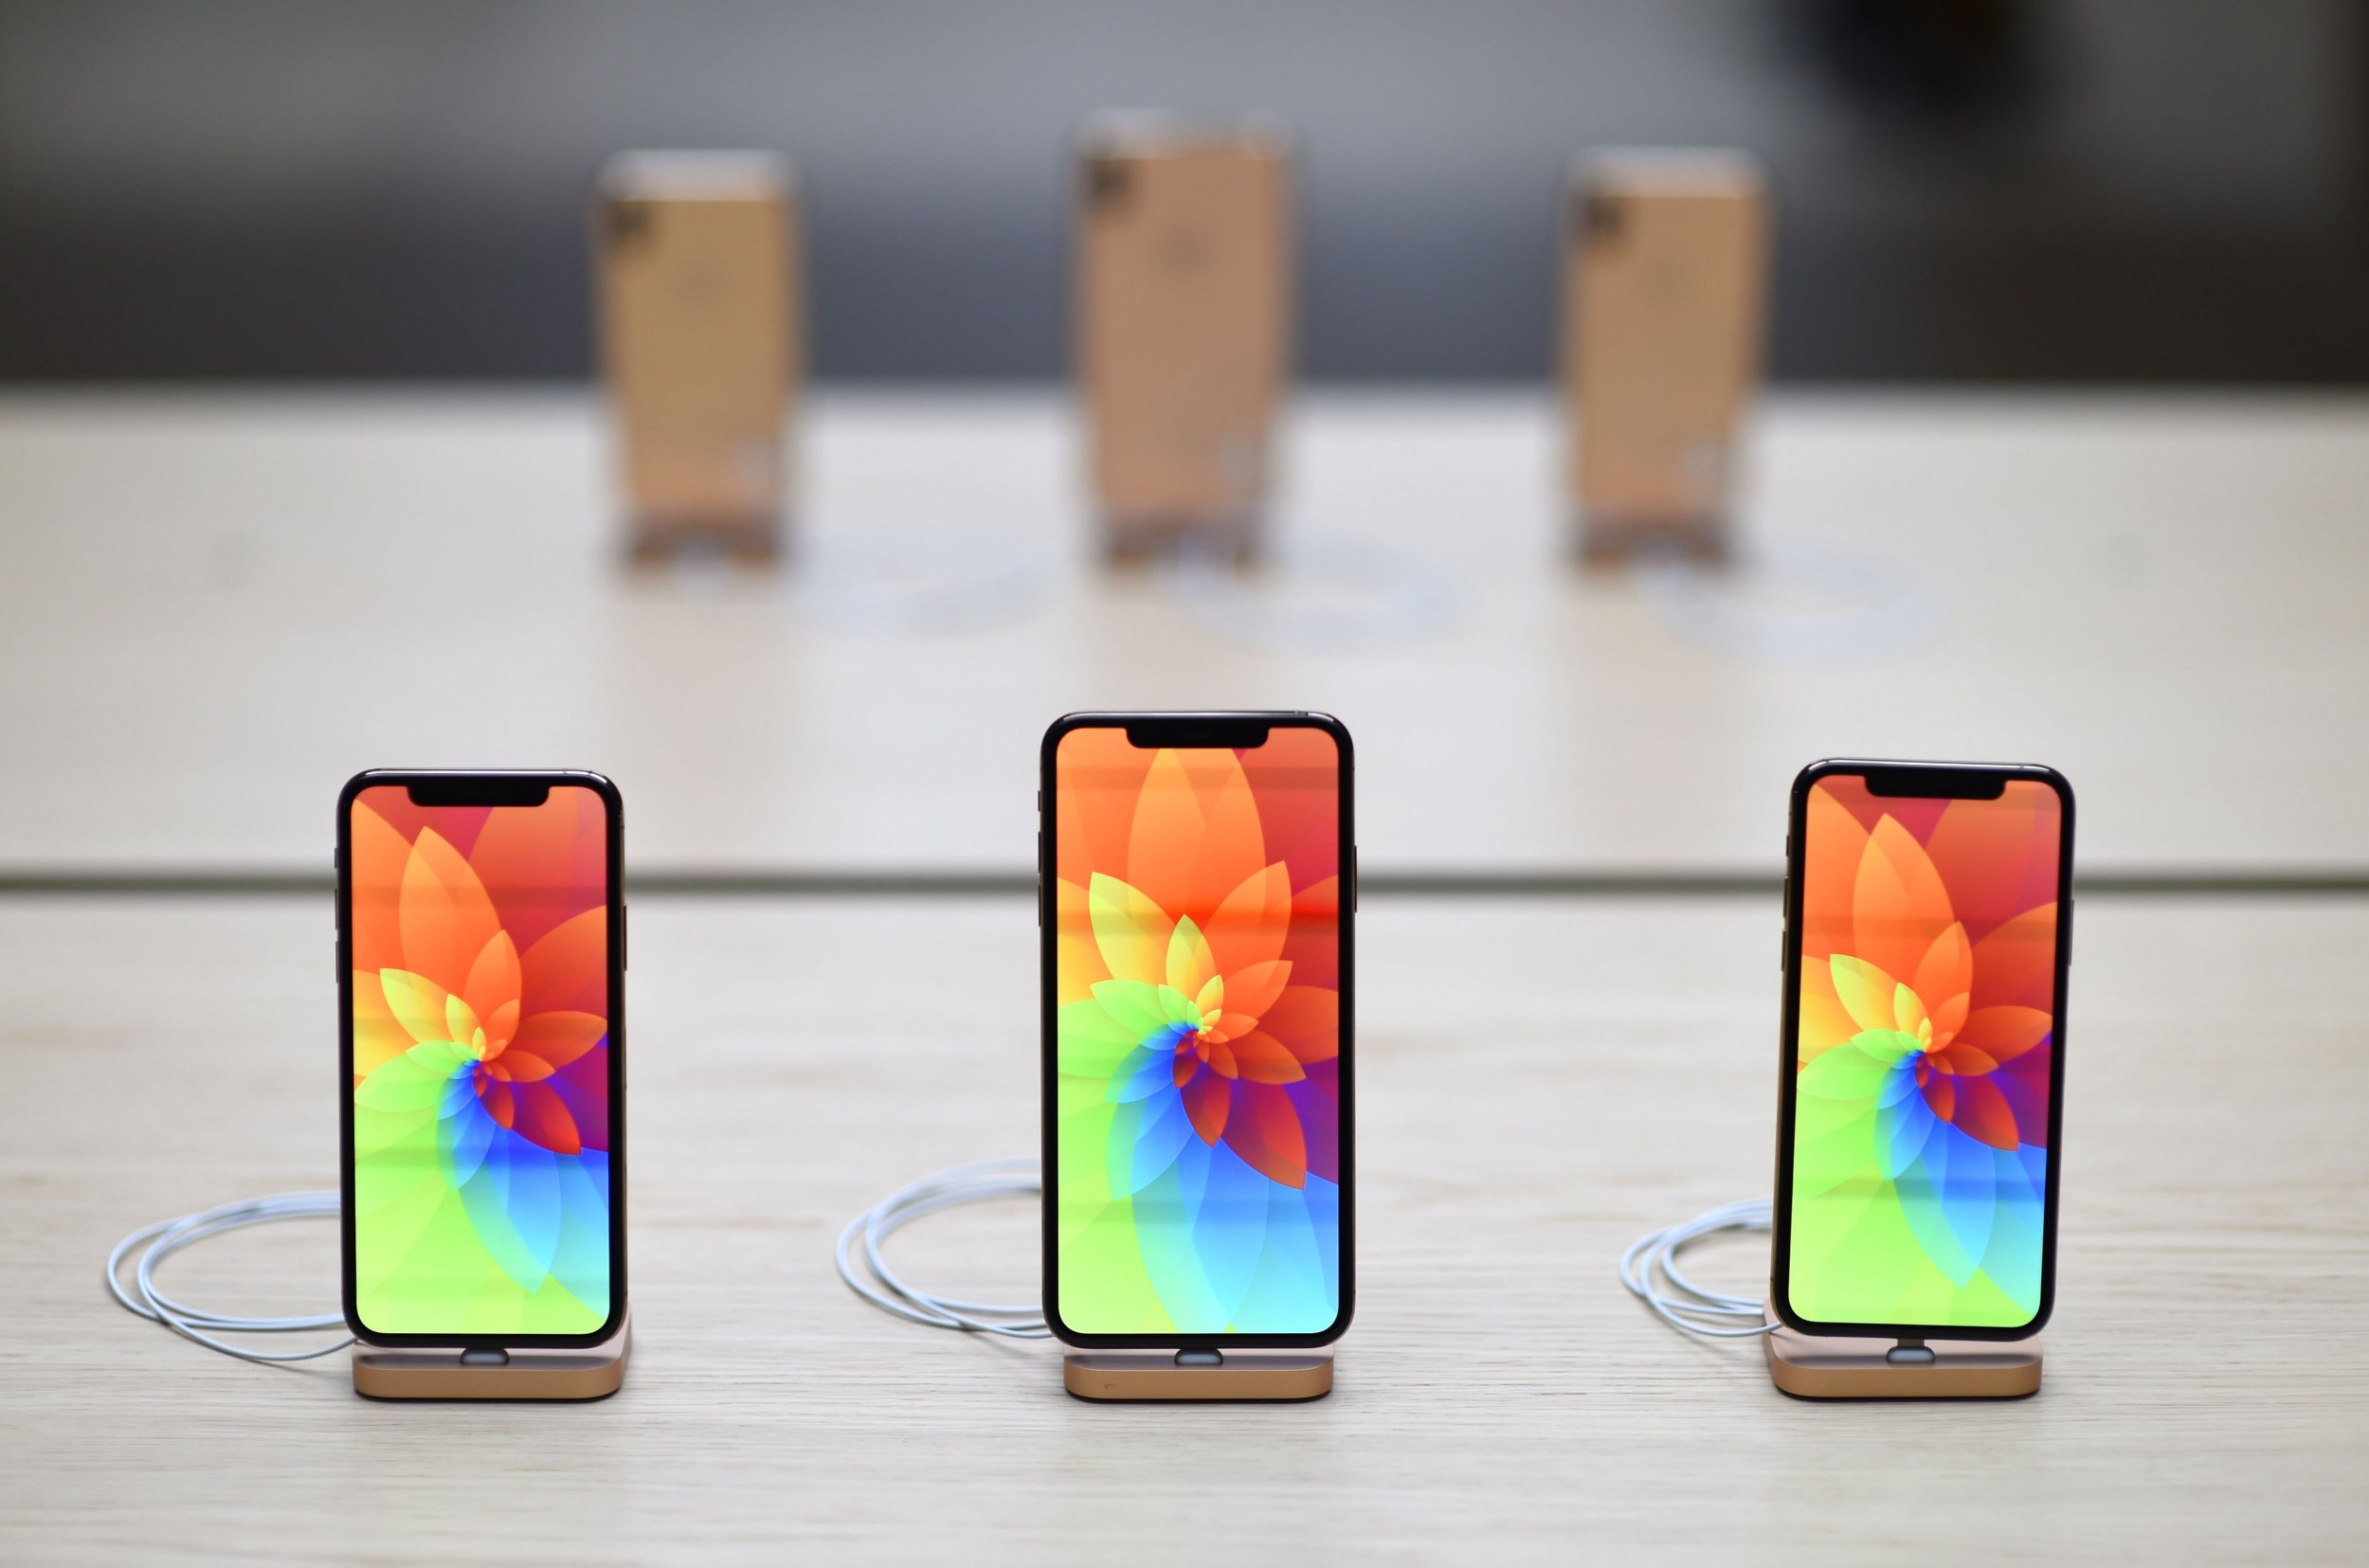 iphone black friday apple cyber monday